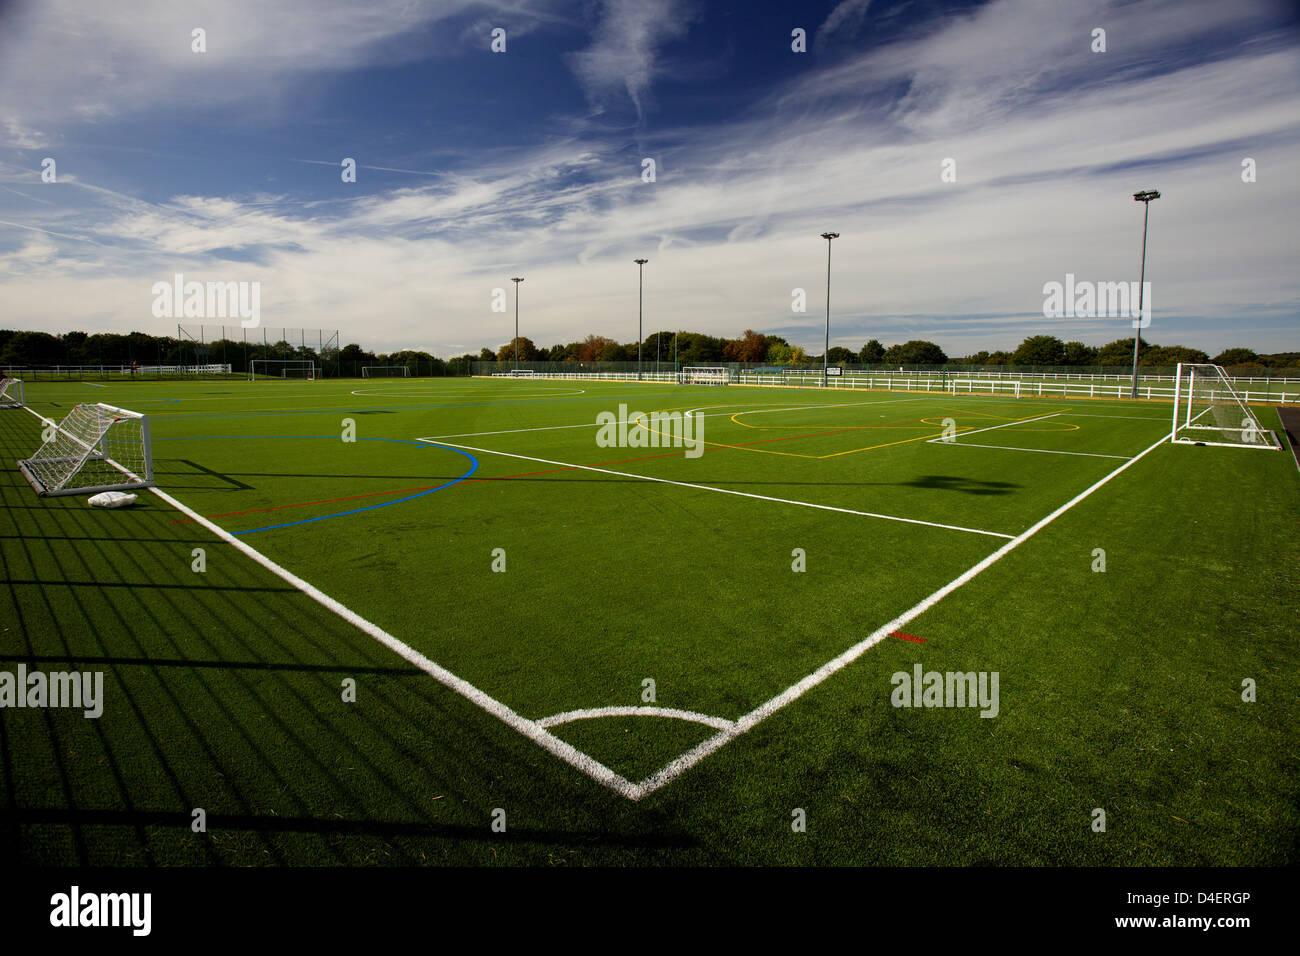 3G sports pitch - Stock Image